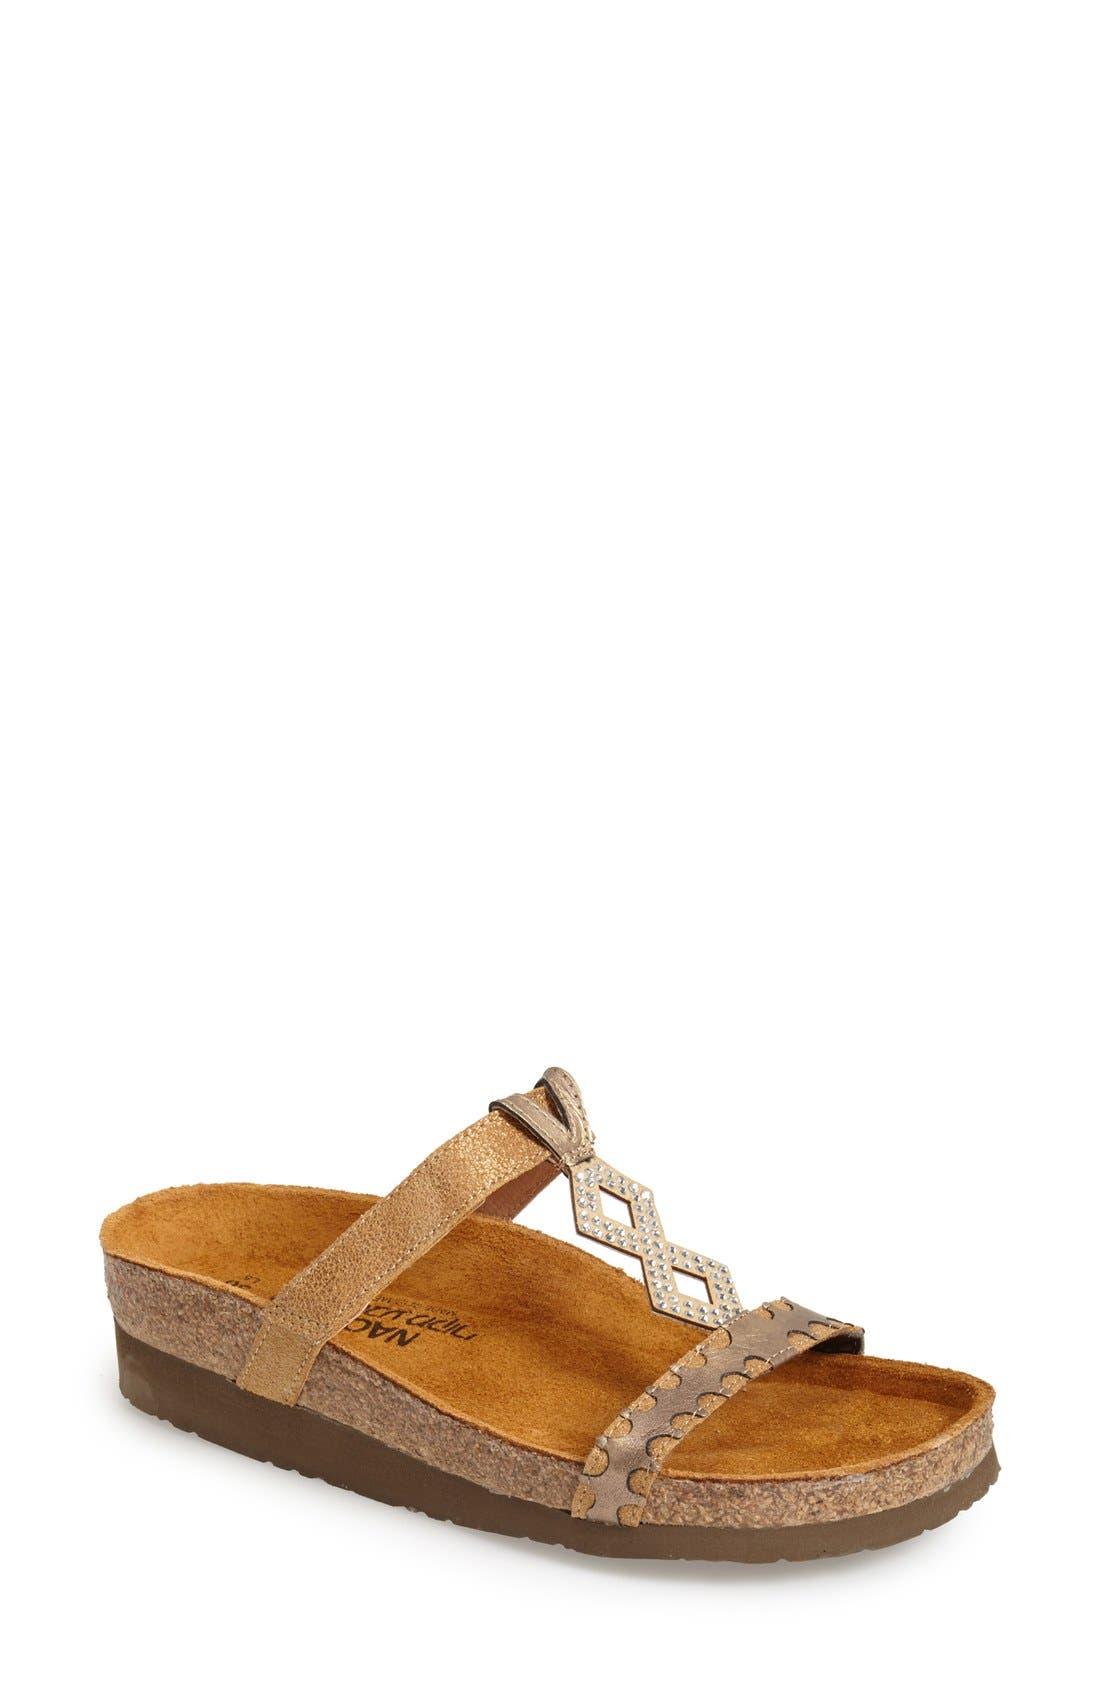 NAOT Embellished Walking Sandal